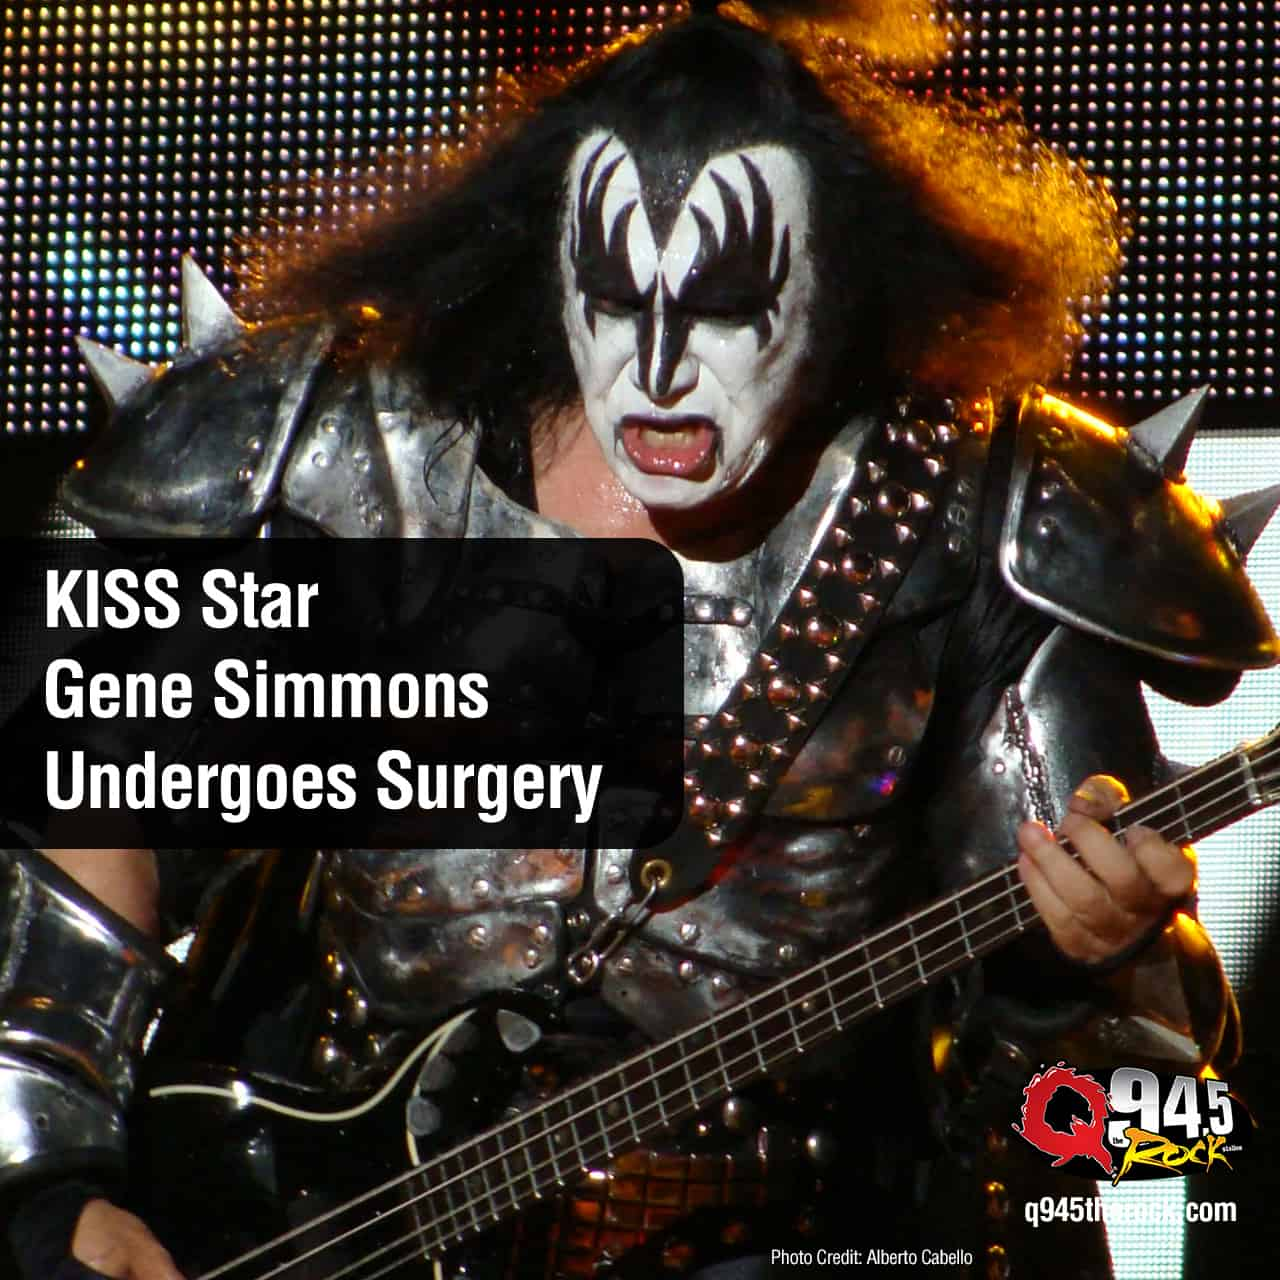 KISS Star Gene Simmons Undergoes Surgery